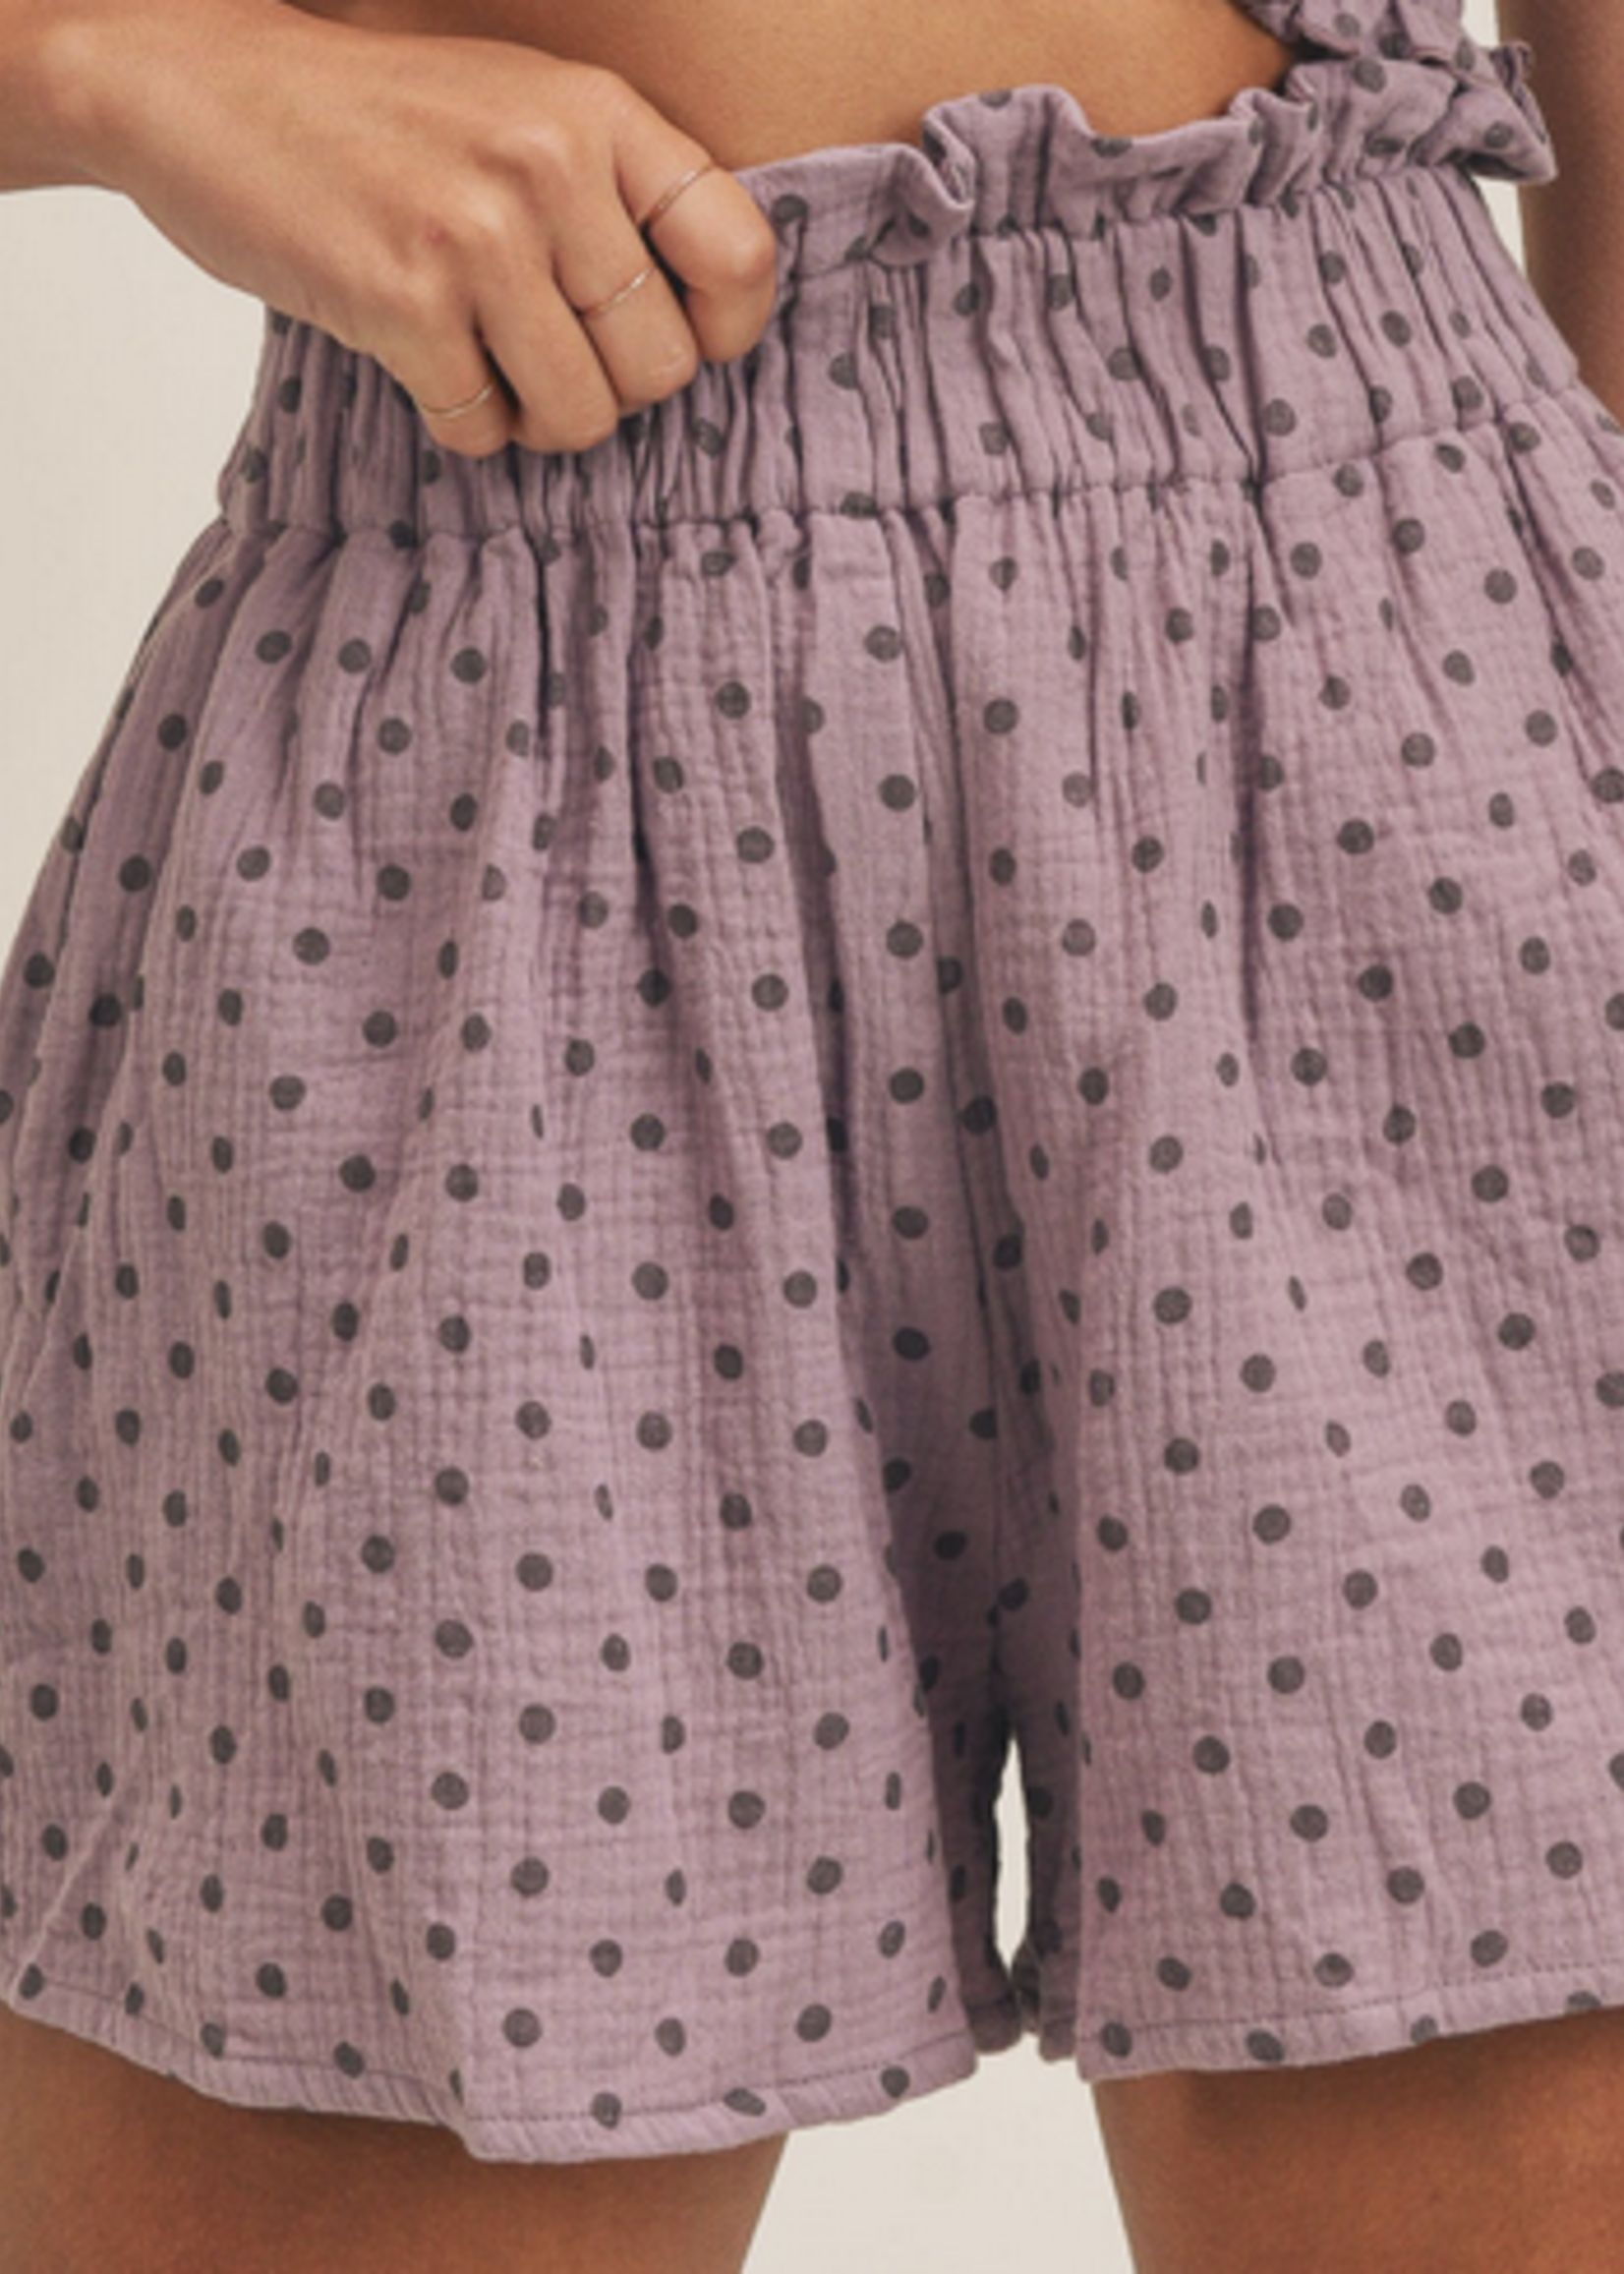 mable mable cameron shorts